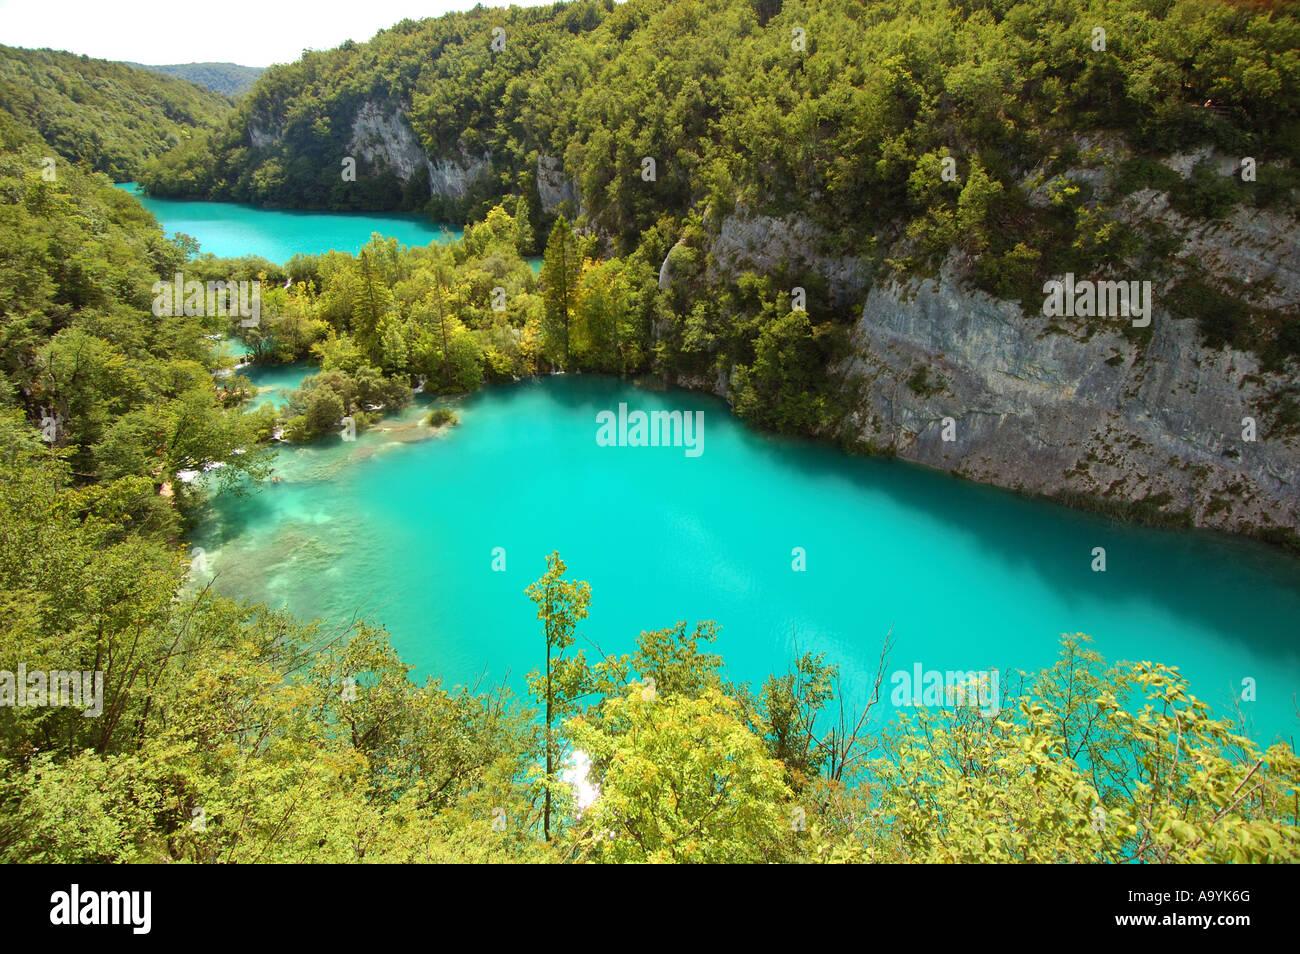 Turquoise lakes and lavish vegetation at the national park of Plitvicer lakes, Croatia - Stock Image